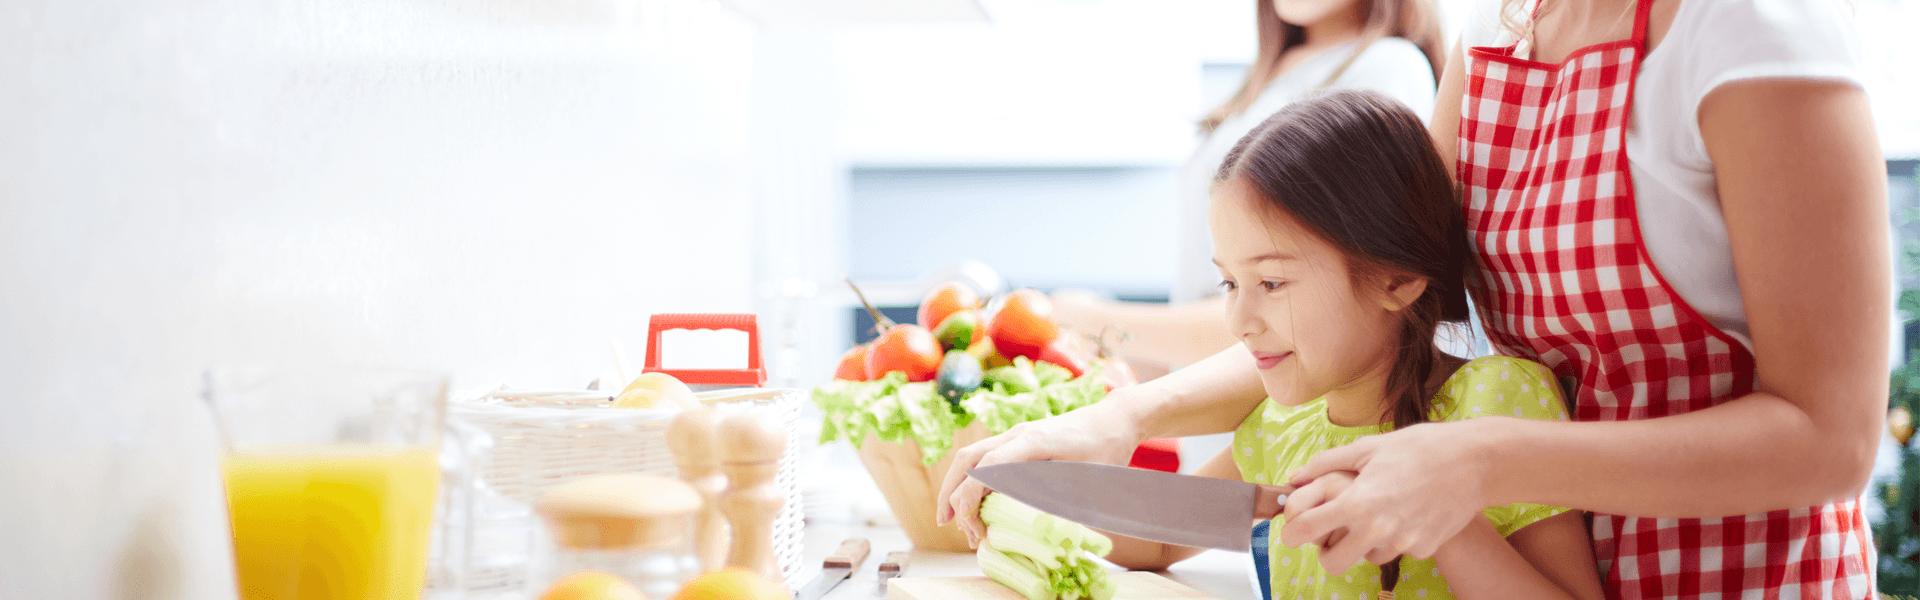 Food Handler Training News